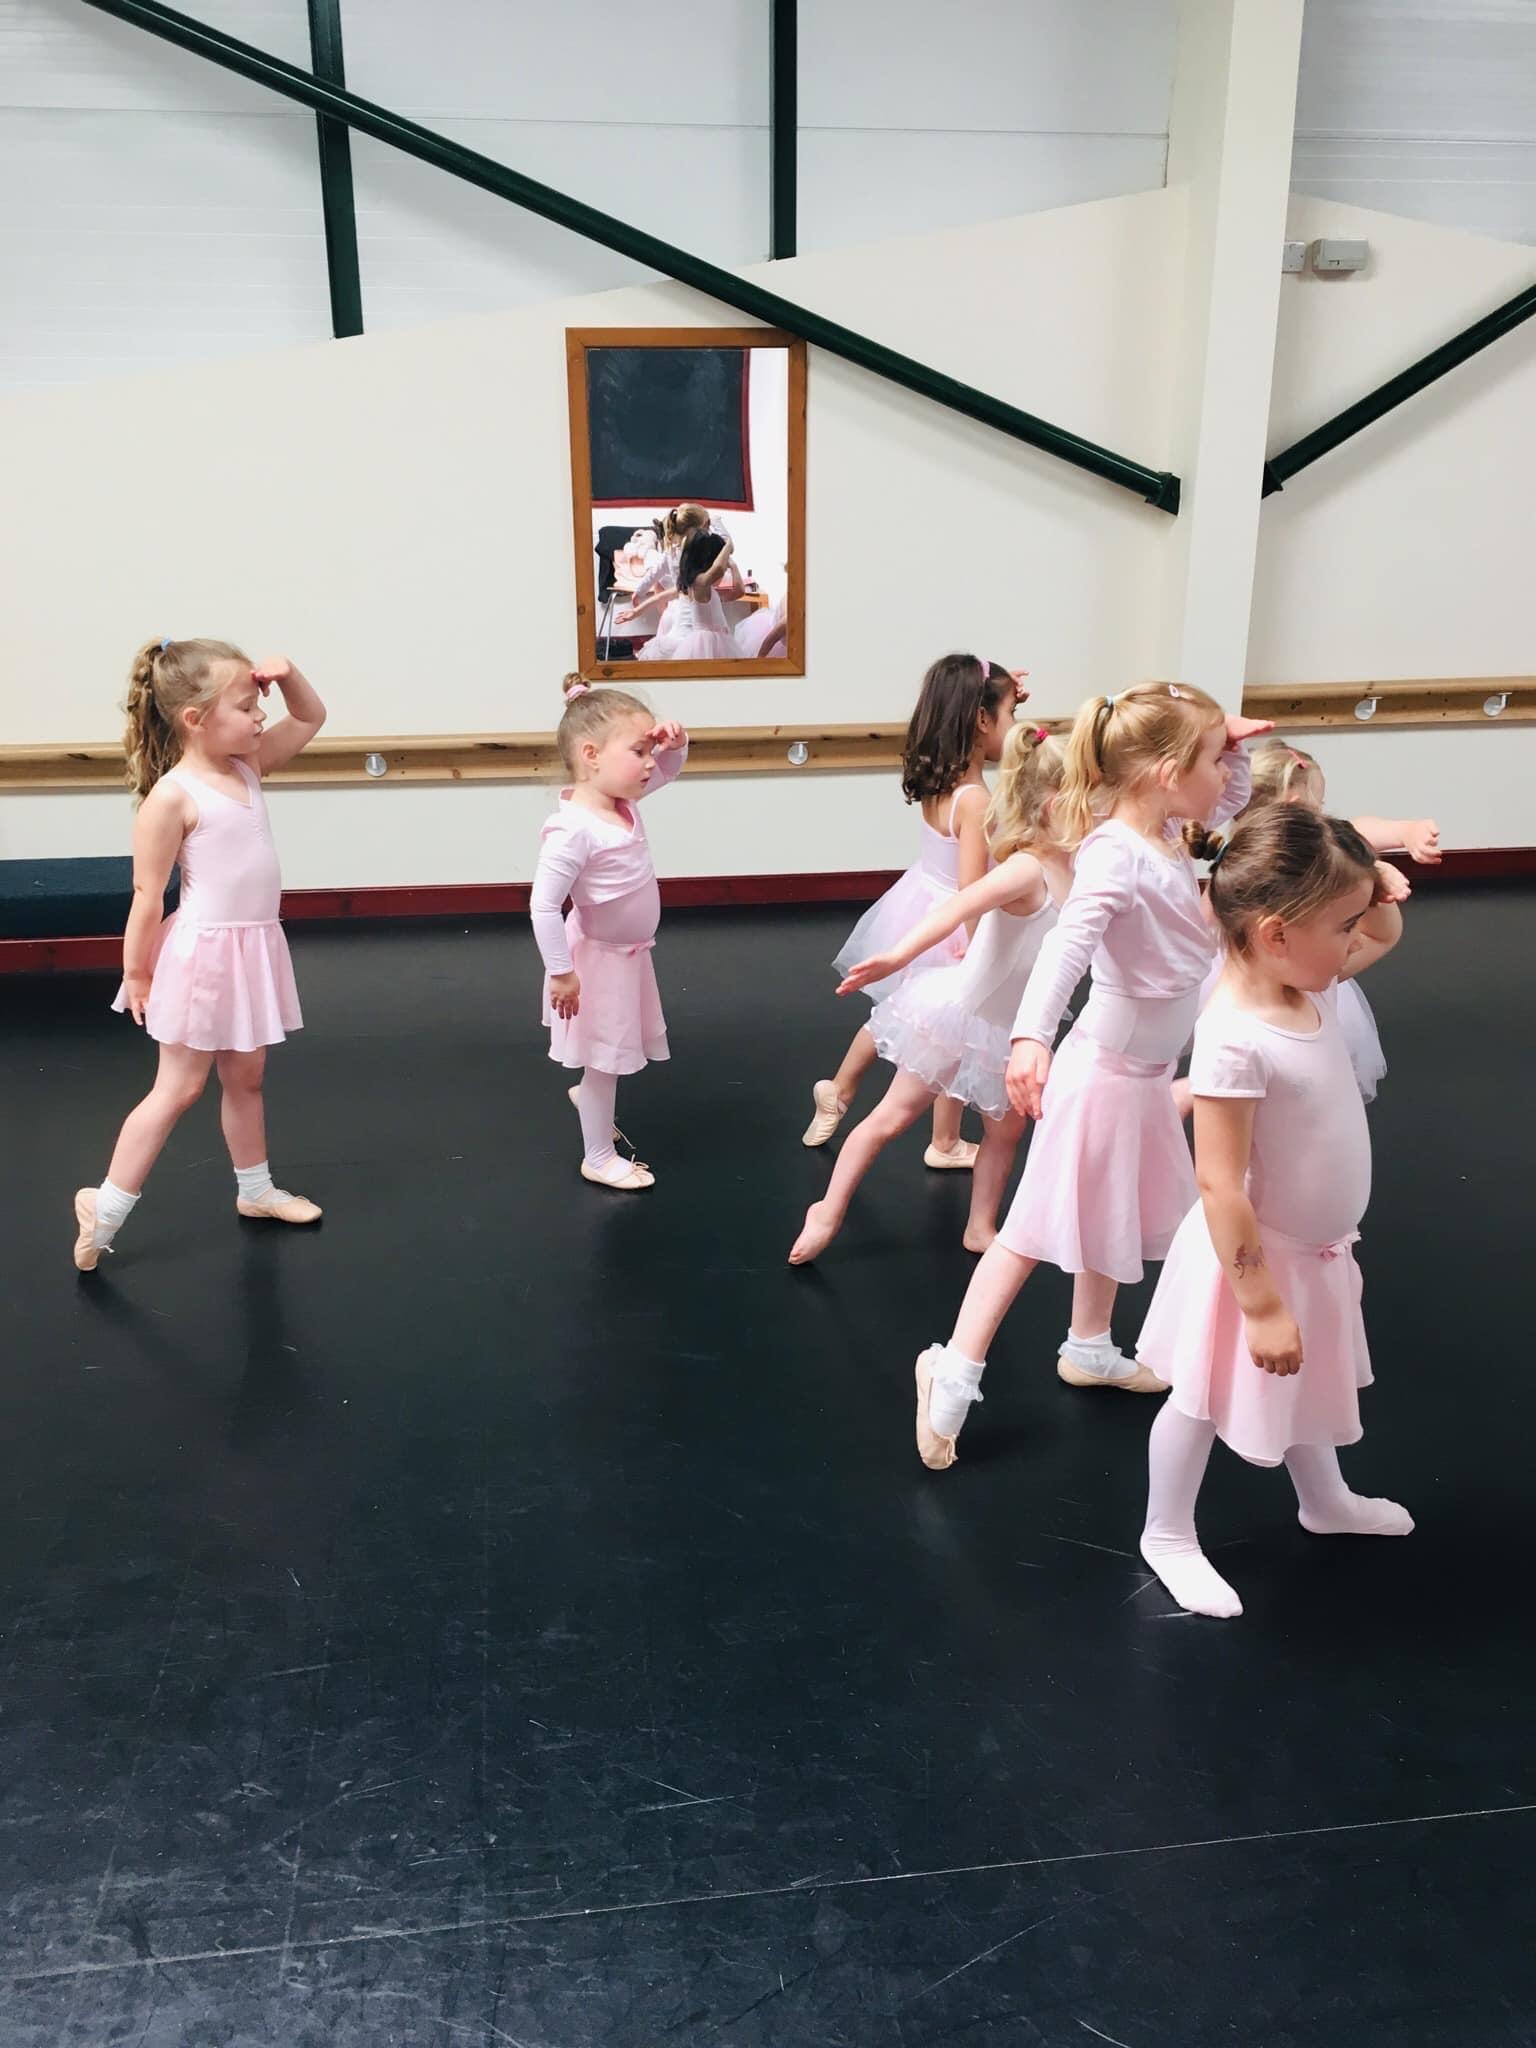 ballet class looking